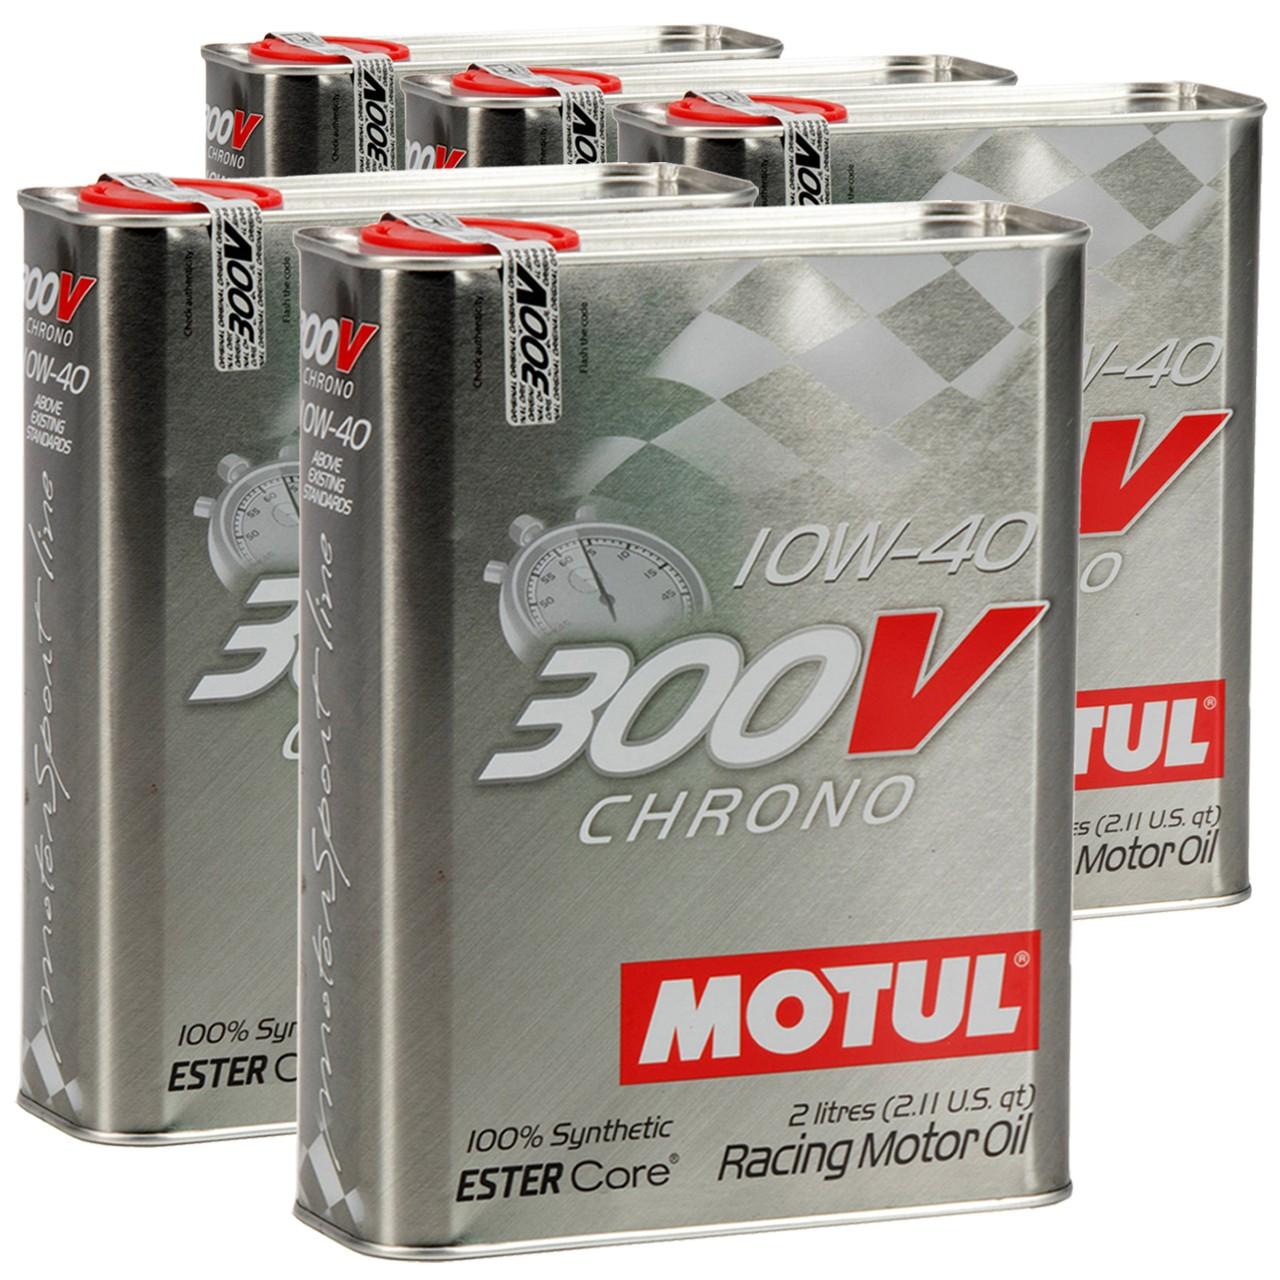 MOTUL 300V CHRONO Motoröl Öl 10W40 100% Synthetic Ester Core - 10L 10 Liter